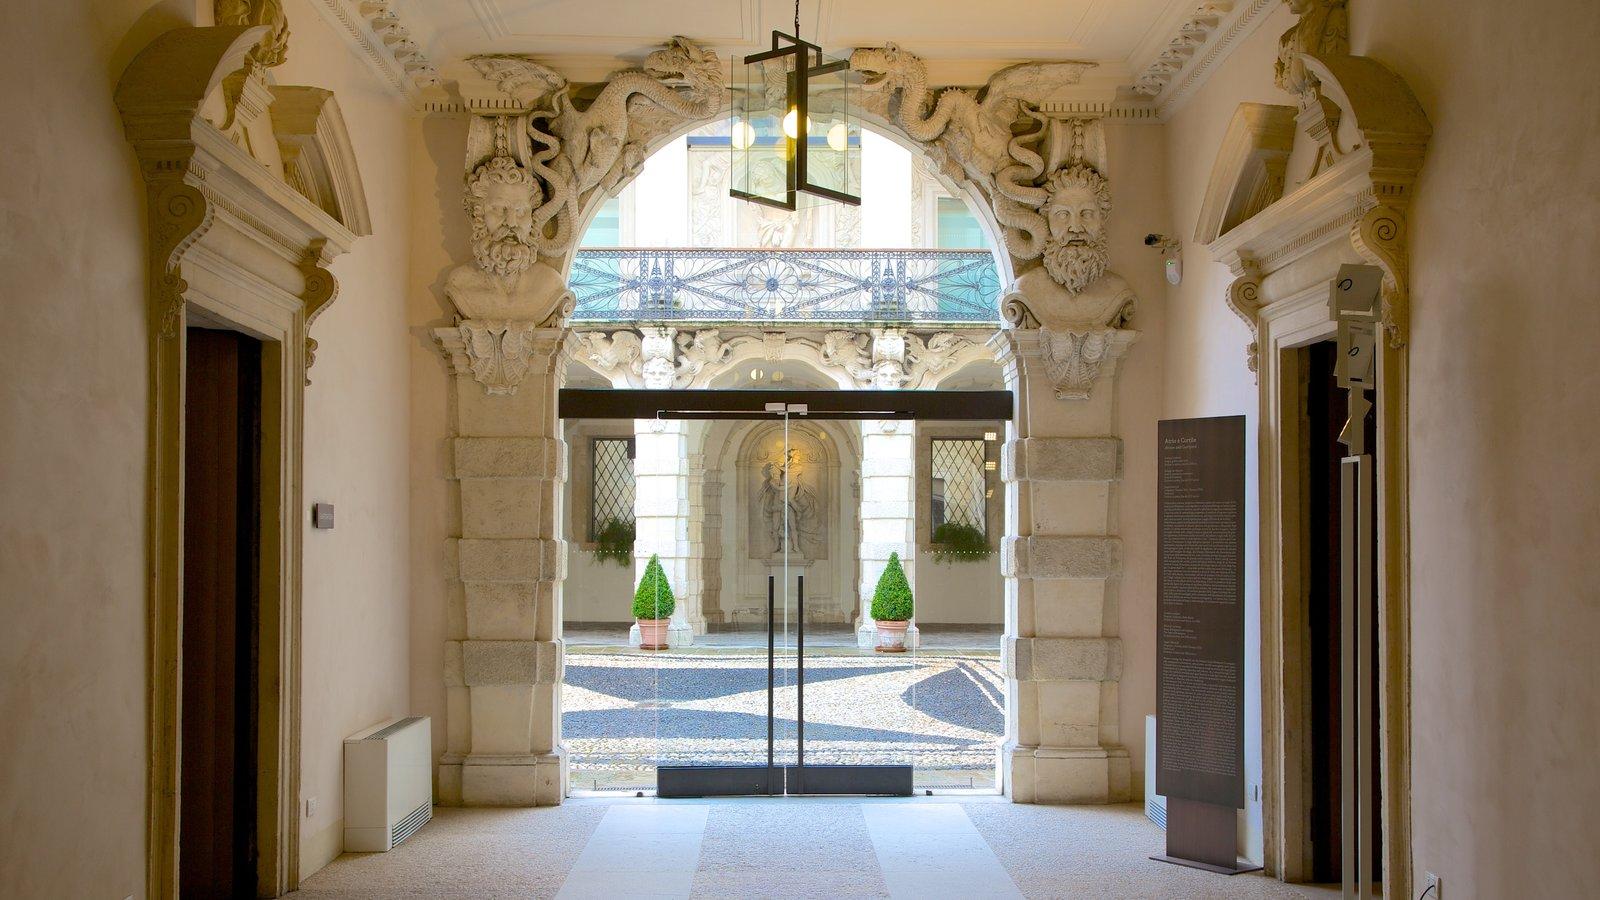 Gallerie di Palazzo Leoni Montanari featuring interior views and a house